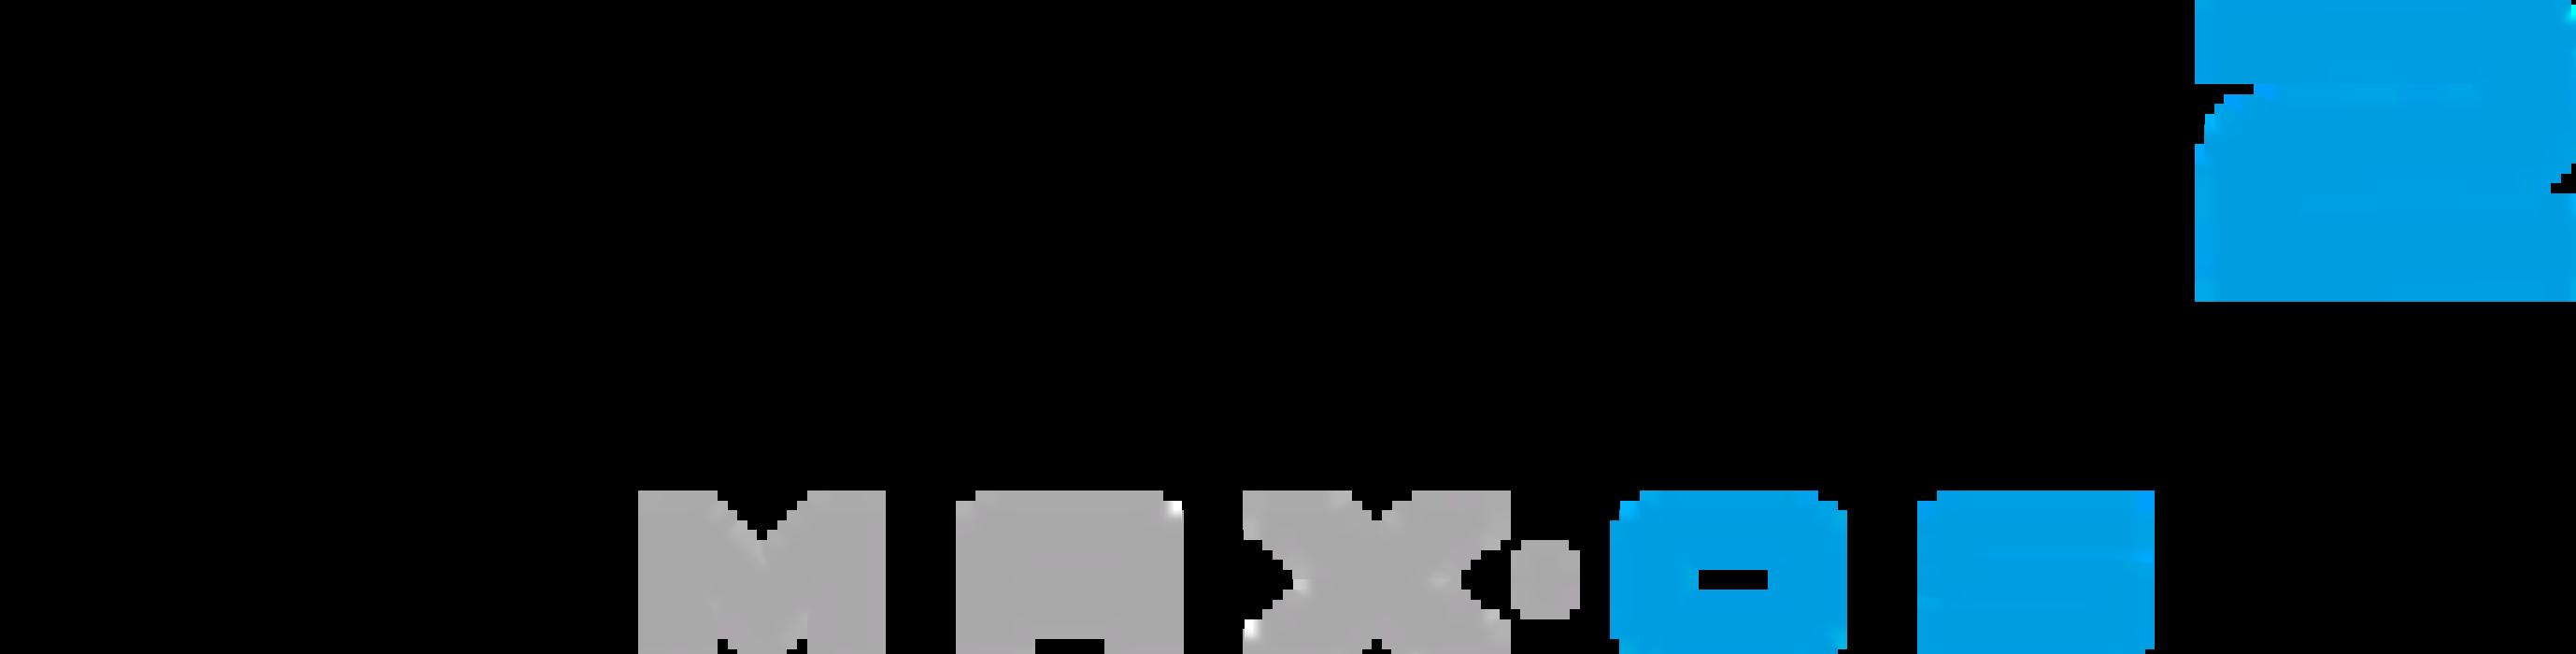 SIM2 Max OS Iron alt